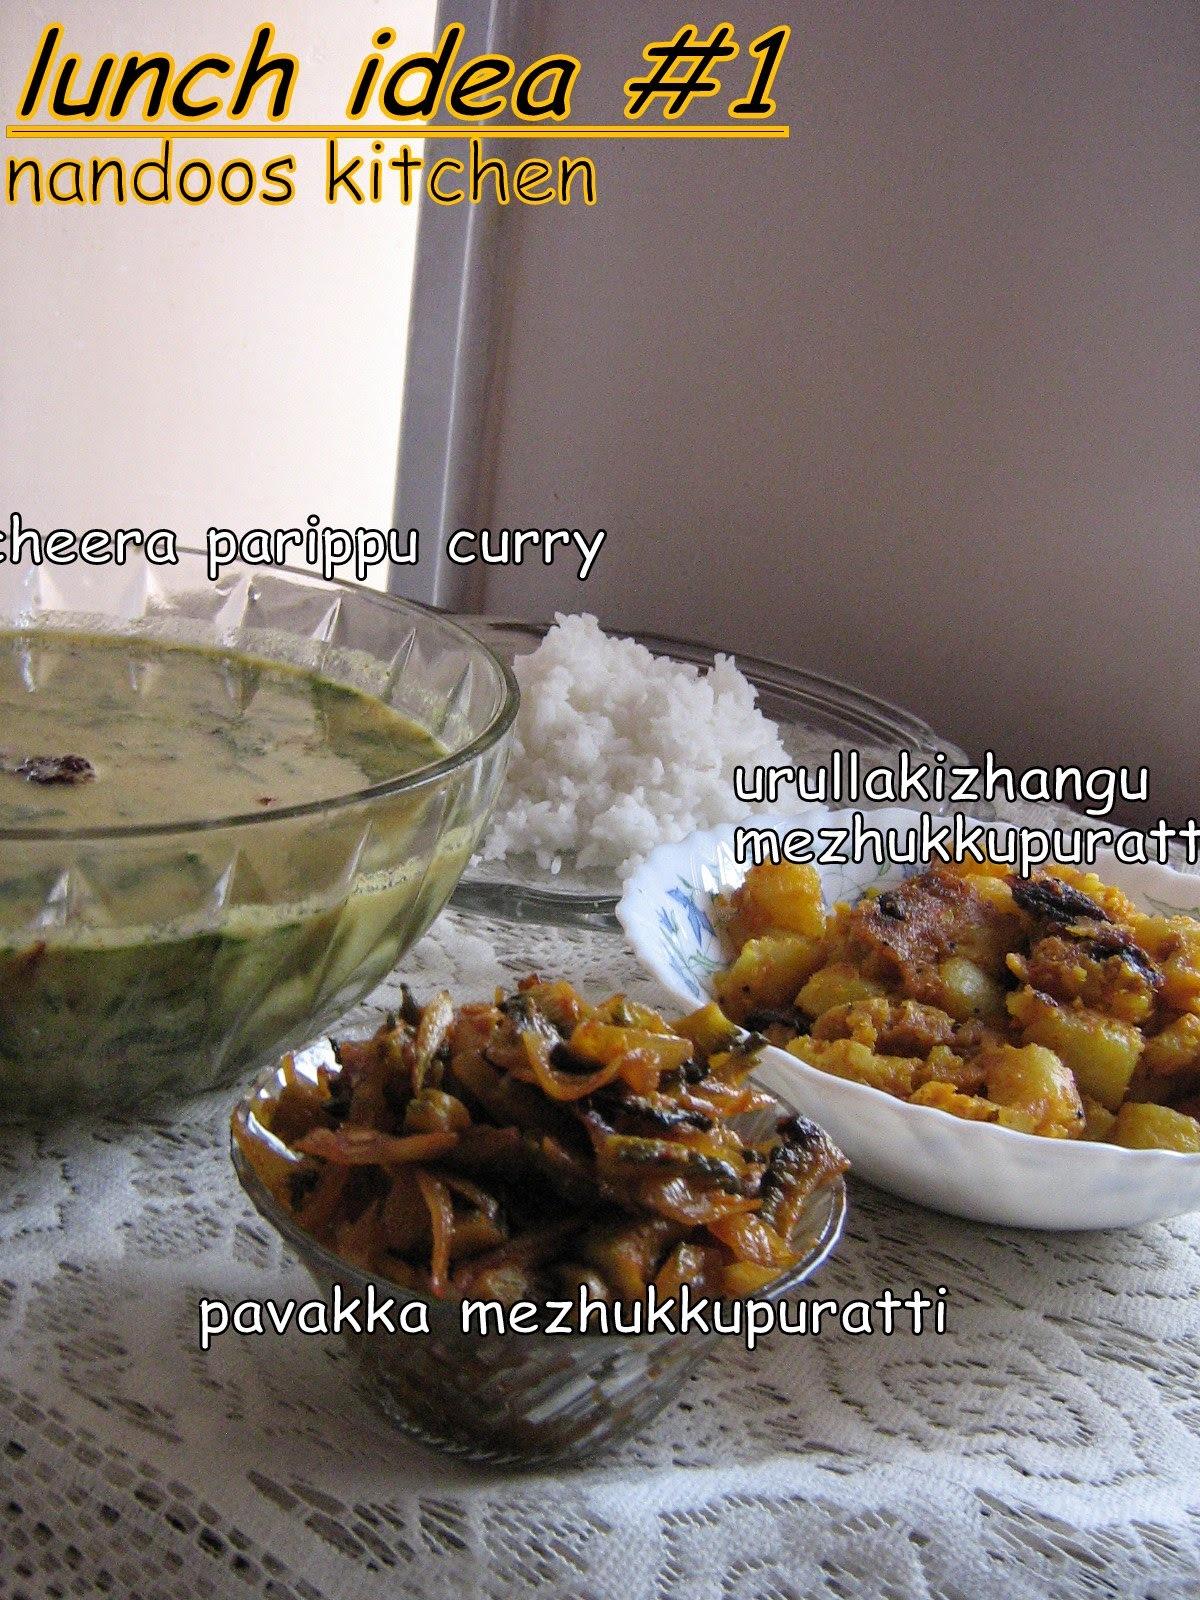 Lunch menu - Easy kerala lunch